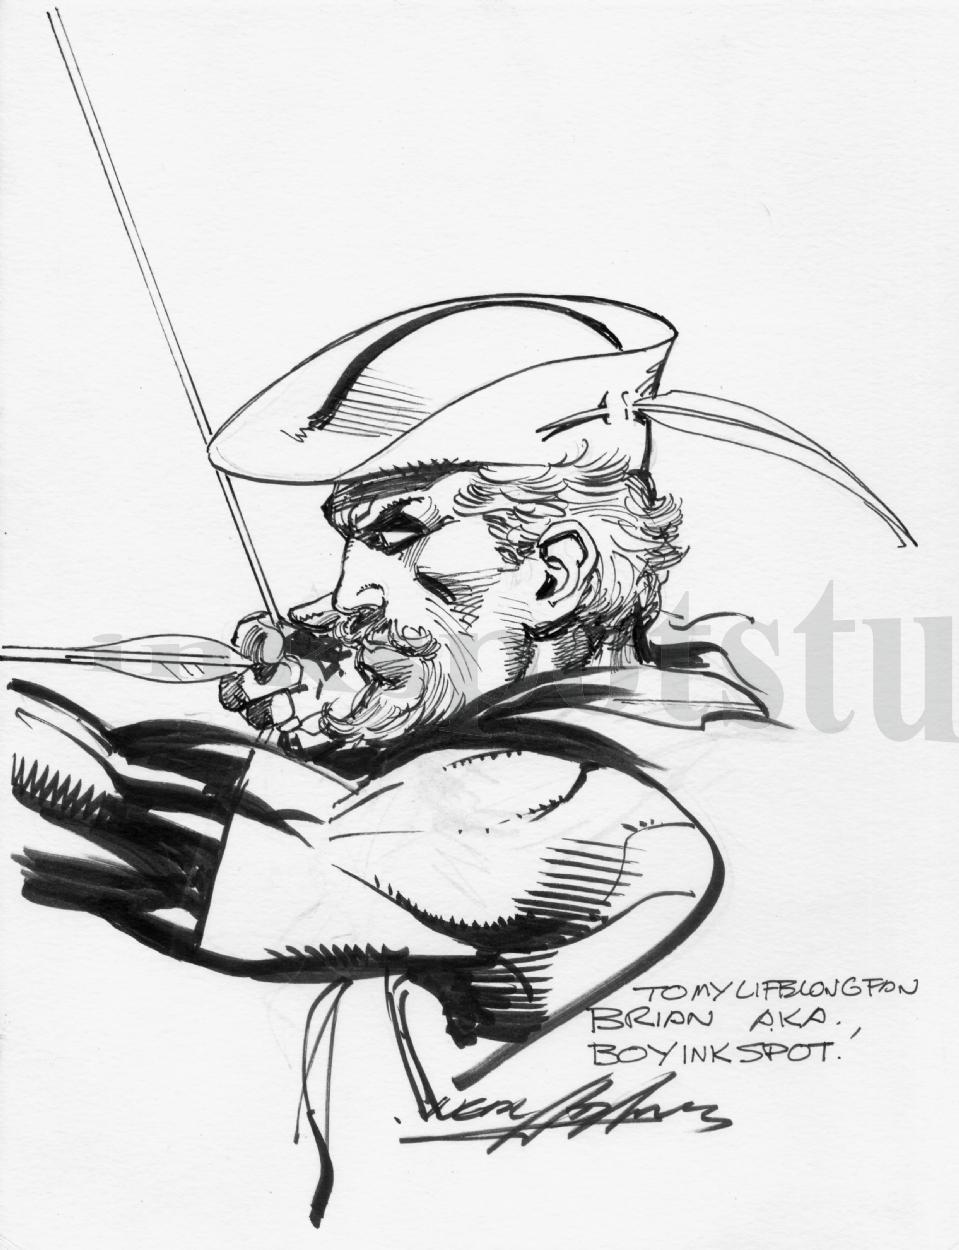 Permanent Sketch Book: Neal Adams Green Arrow Sketch, In Brian G. McKenna's